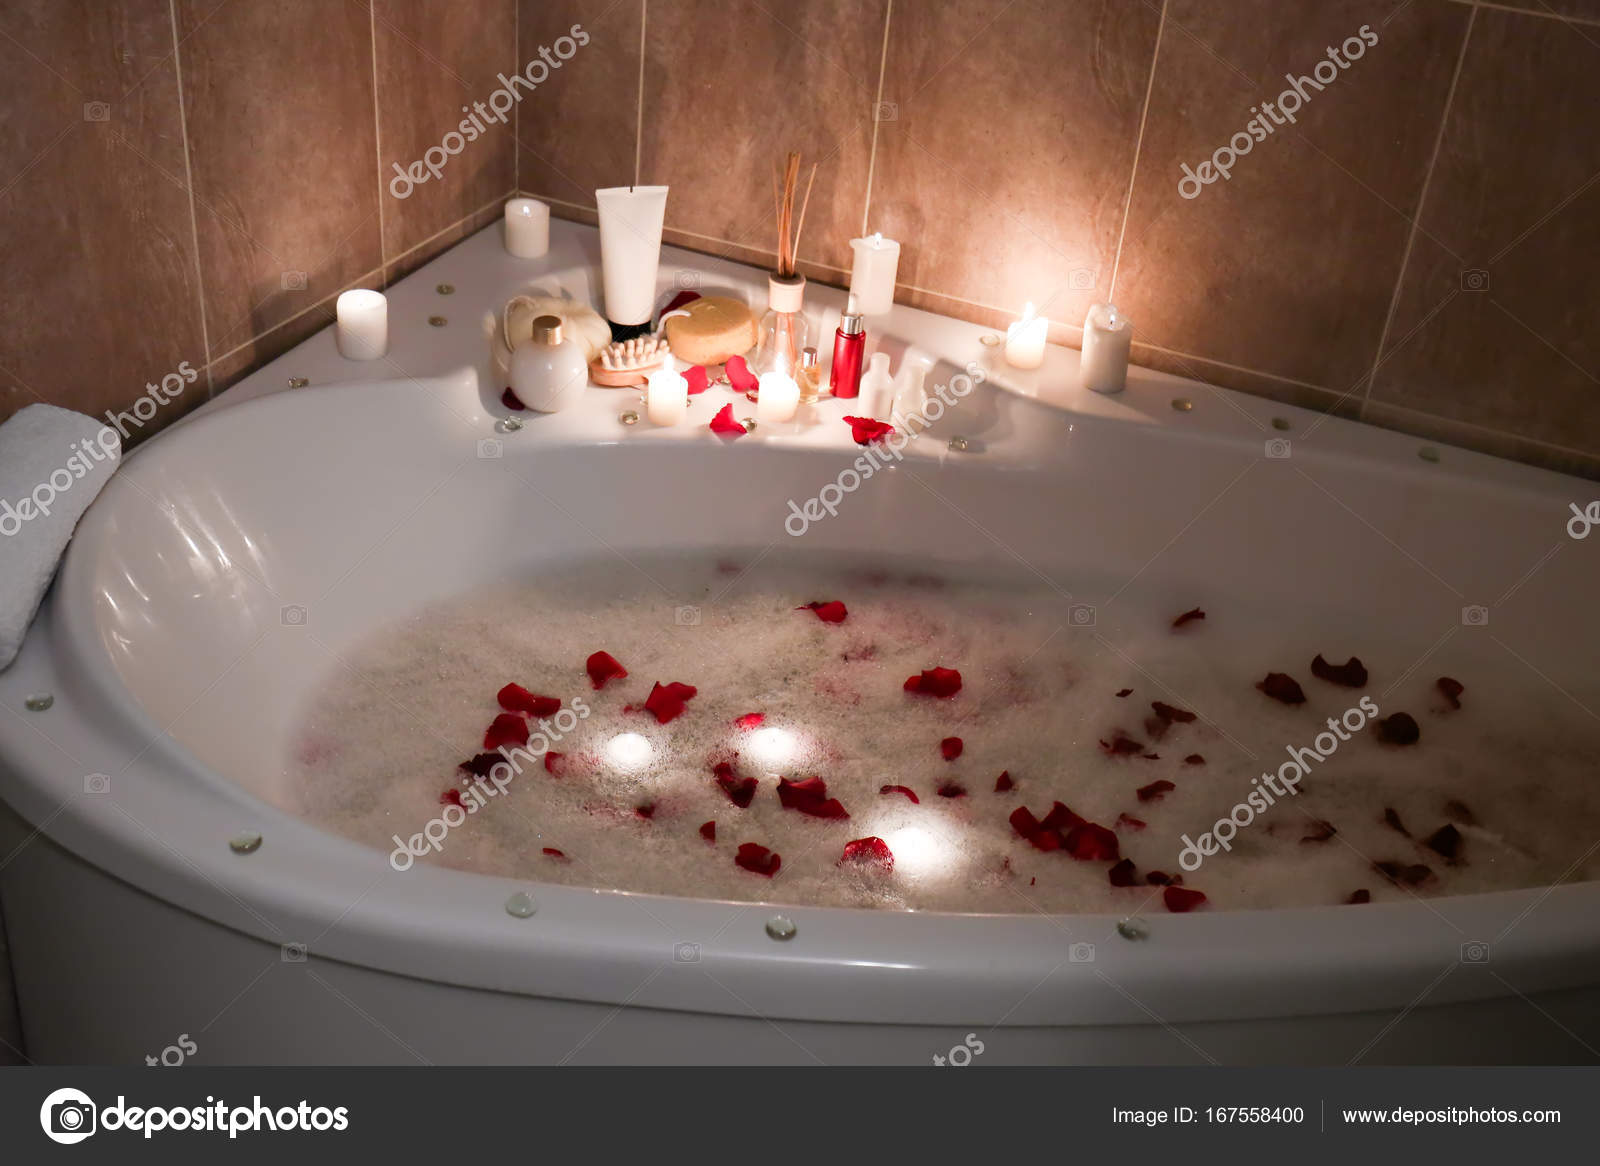 Vasca da bagno romantica - Vasca da bagno romantica ...